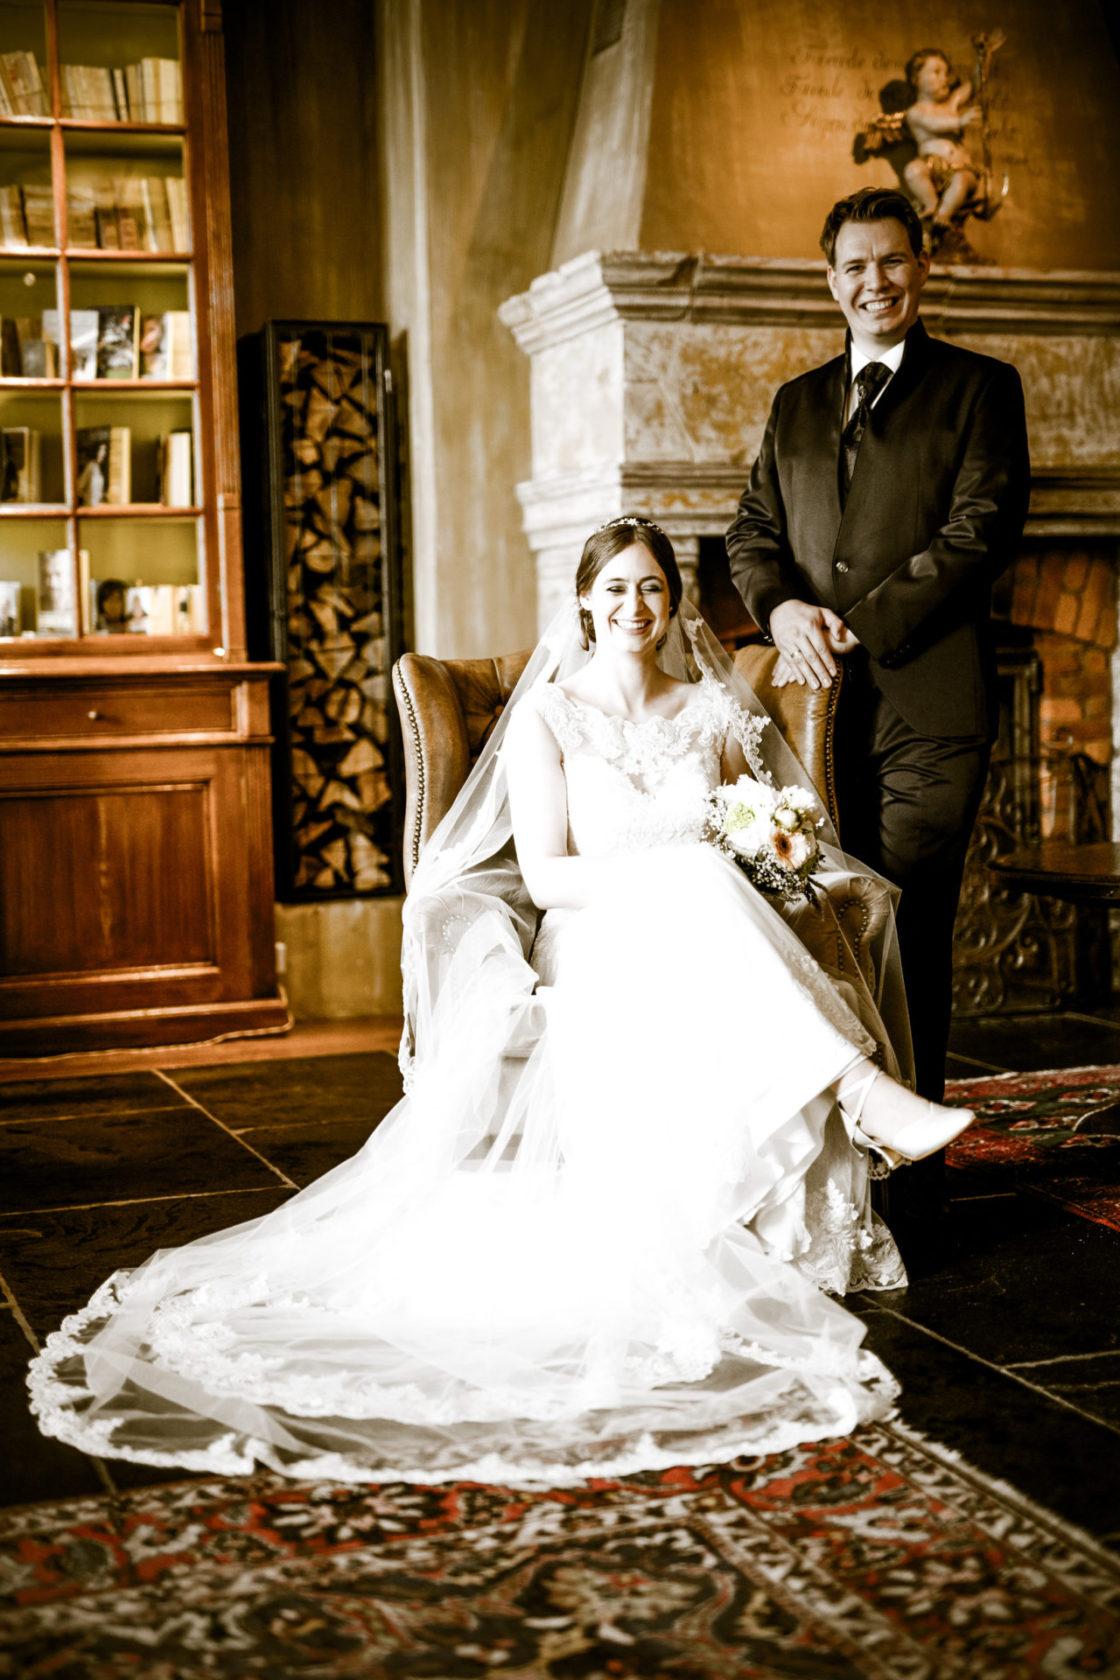 Hochzeitsfotografei im Europapark - Bell Rock